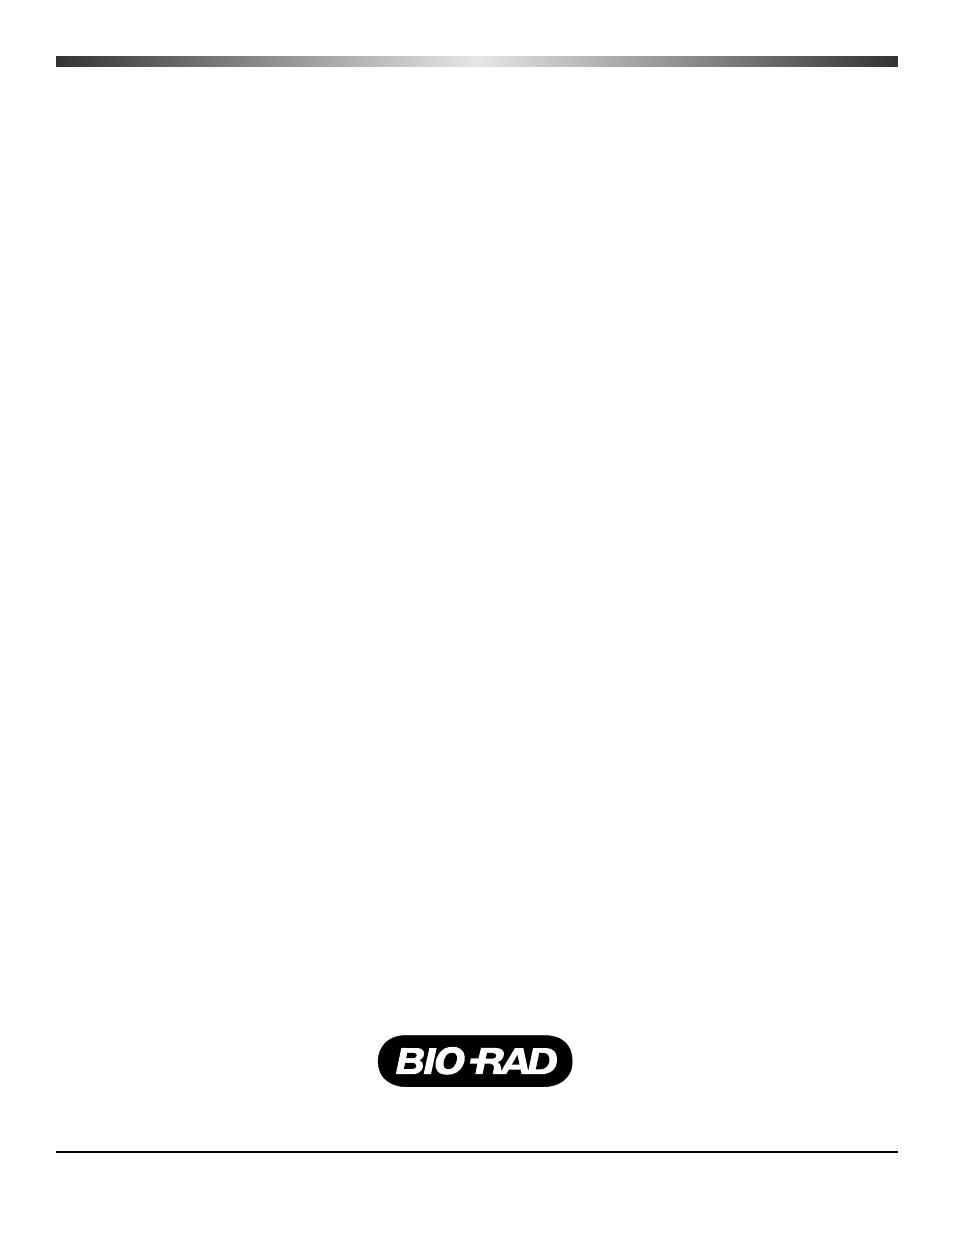 Bio Rad Mini Protean Tetra Handcast Systems User Manual 10 Pages